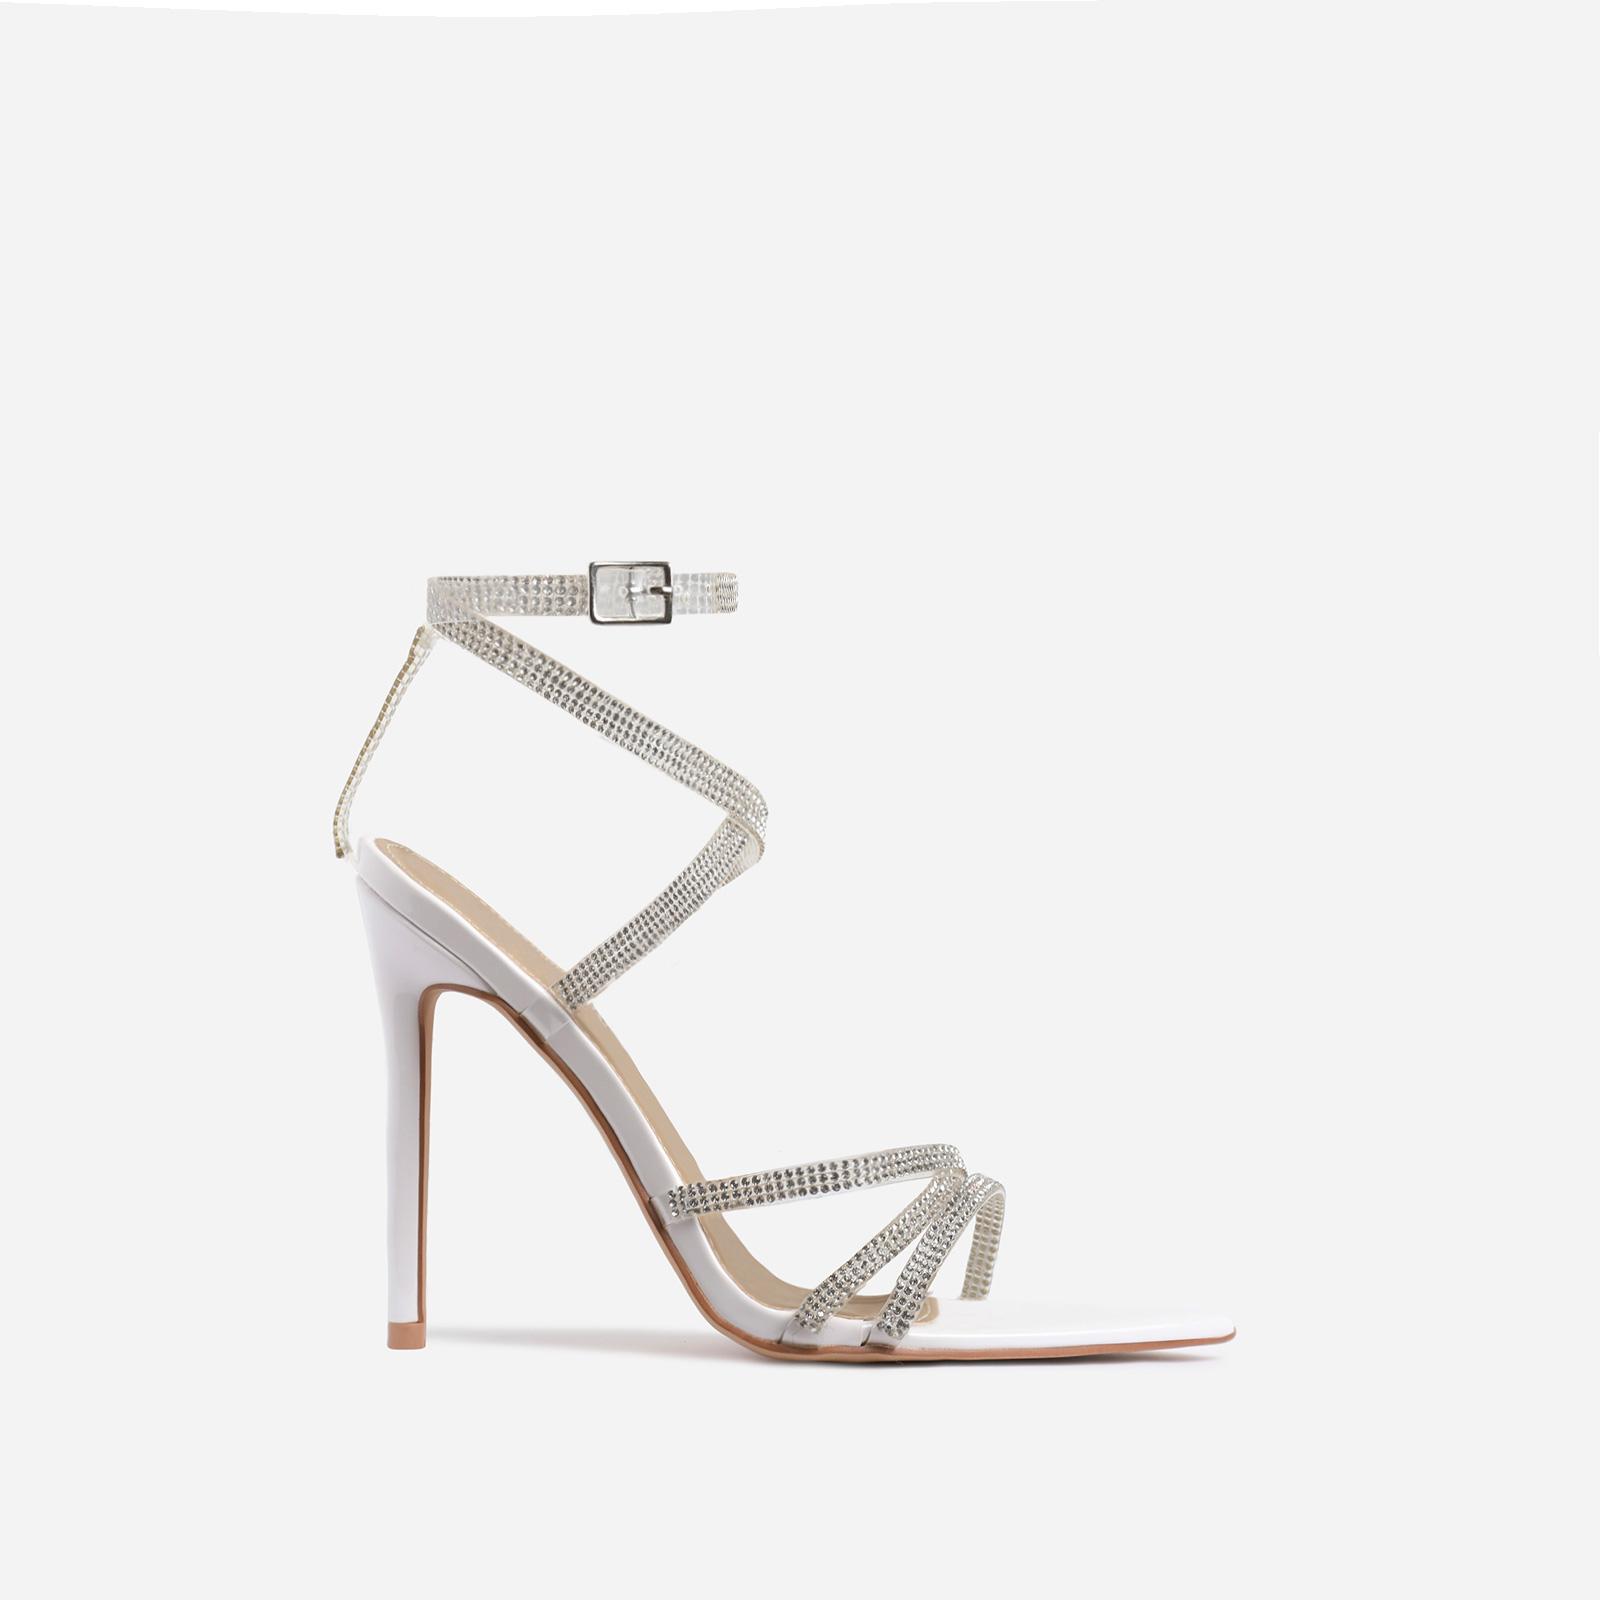 Precious Diamante Detail Pointed Toe Heel In White Patent